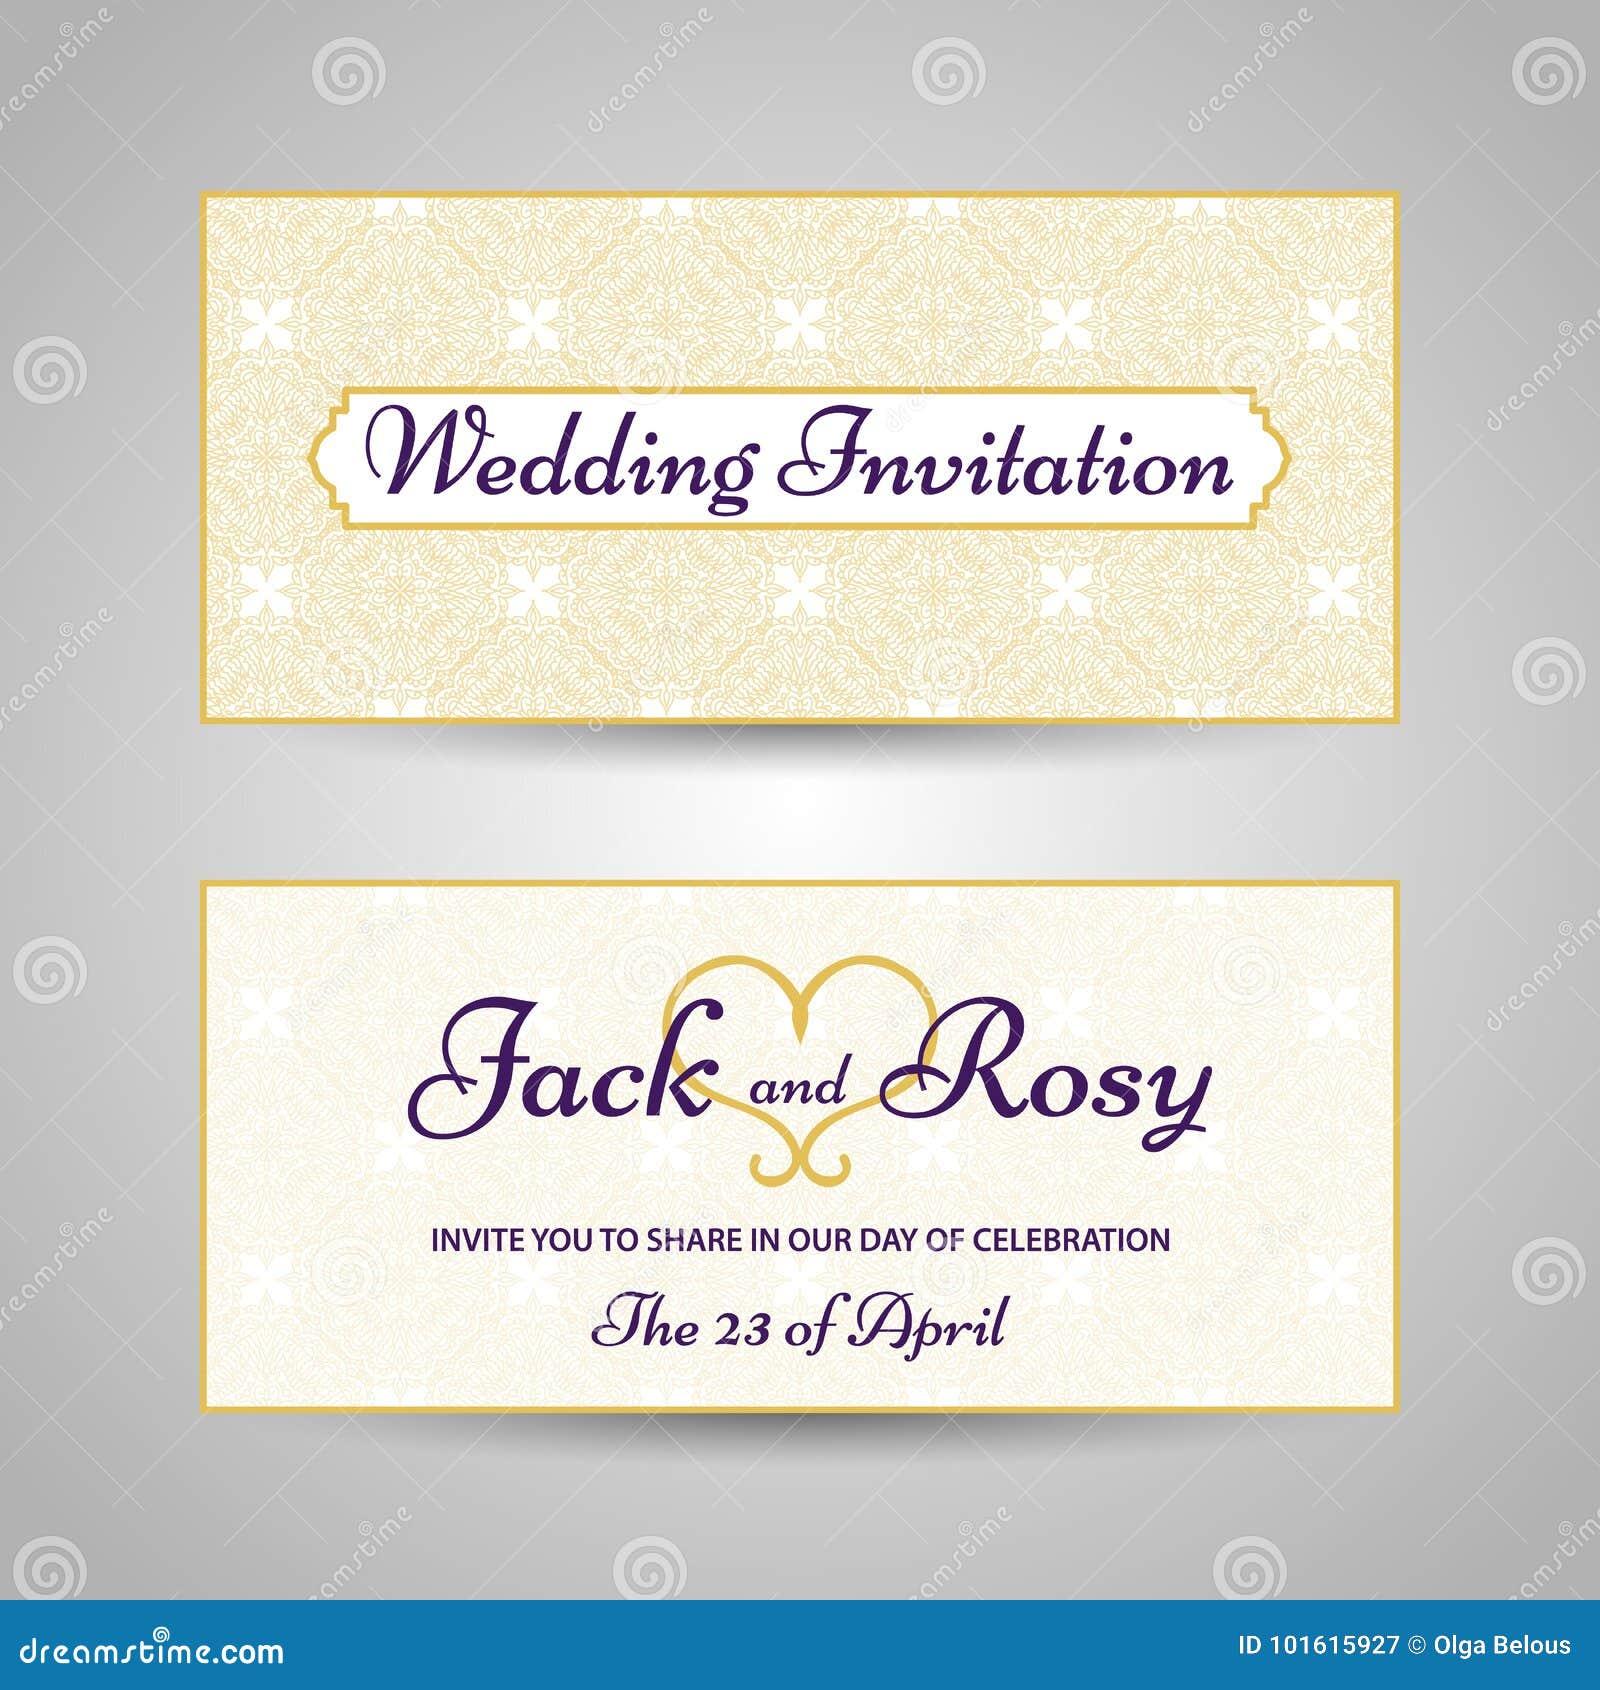 Arabic Style Wedding Invitation Stock Vector - Illustration of card ...